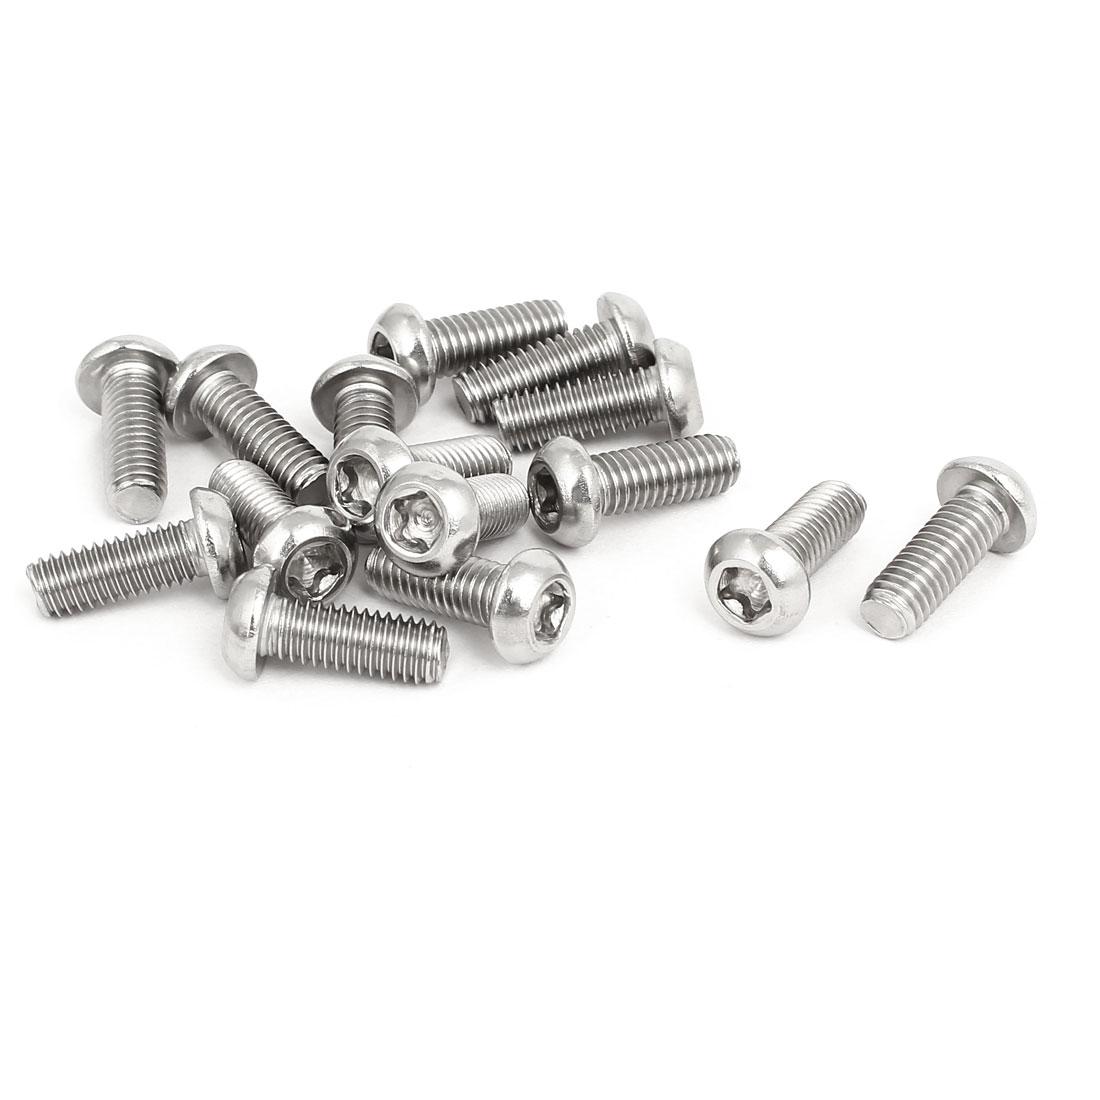 M6x16mm 304 Stainless Steel Fully Thread Button Head Torx Five-Lobe Screw 15pcs